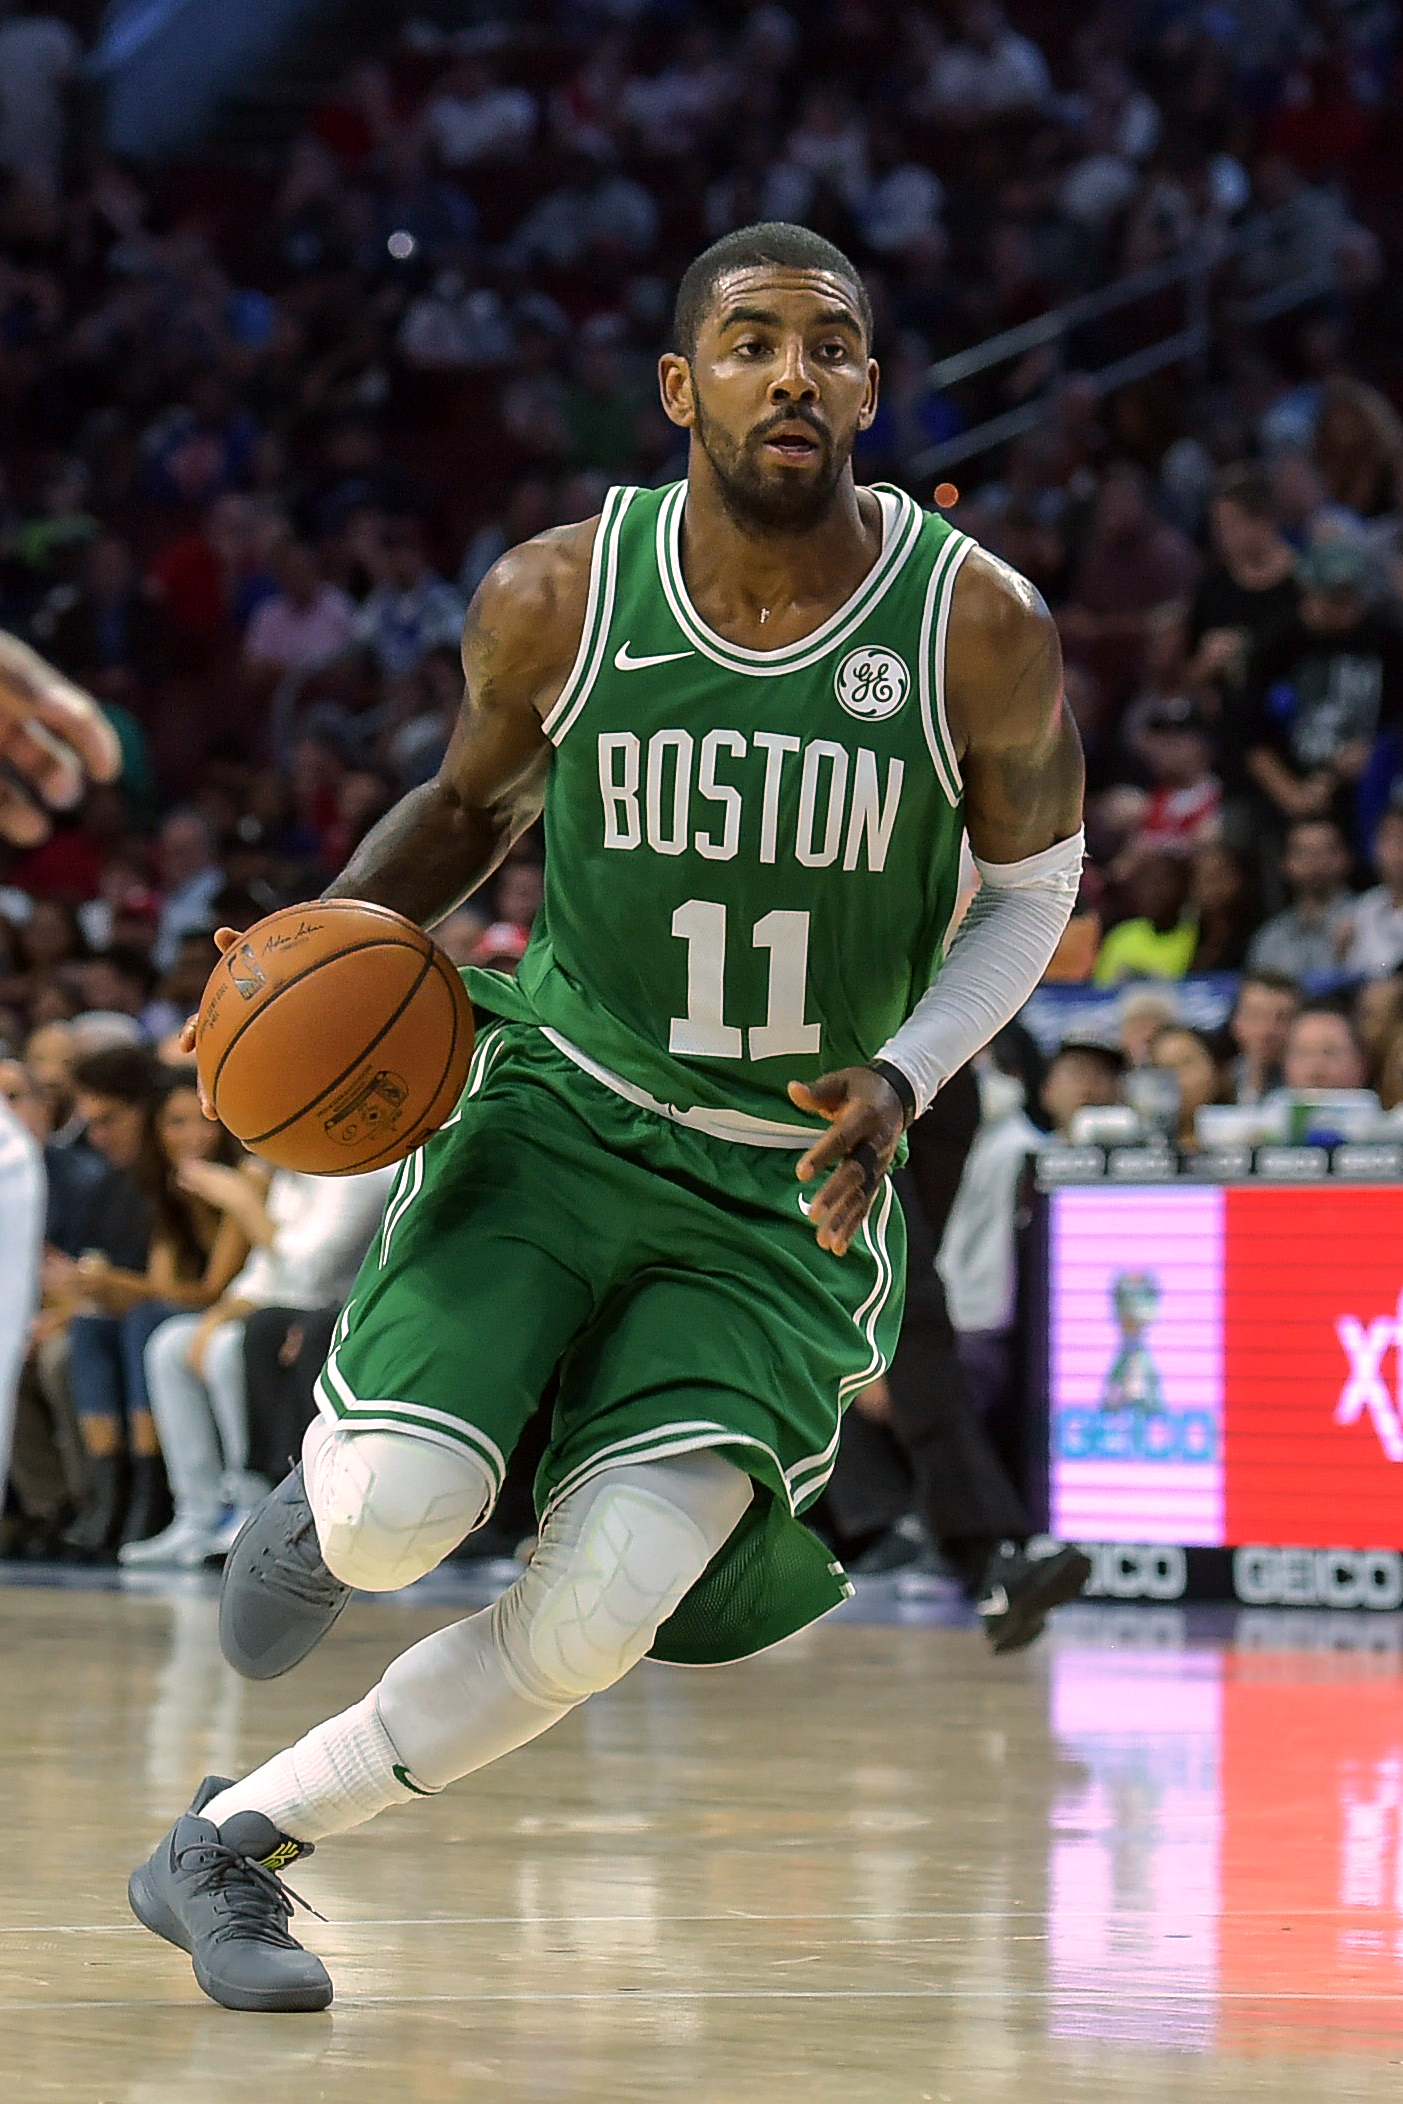 Celtics at Cavaliers - It's finally game day!!! - CelticsBlog